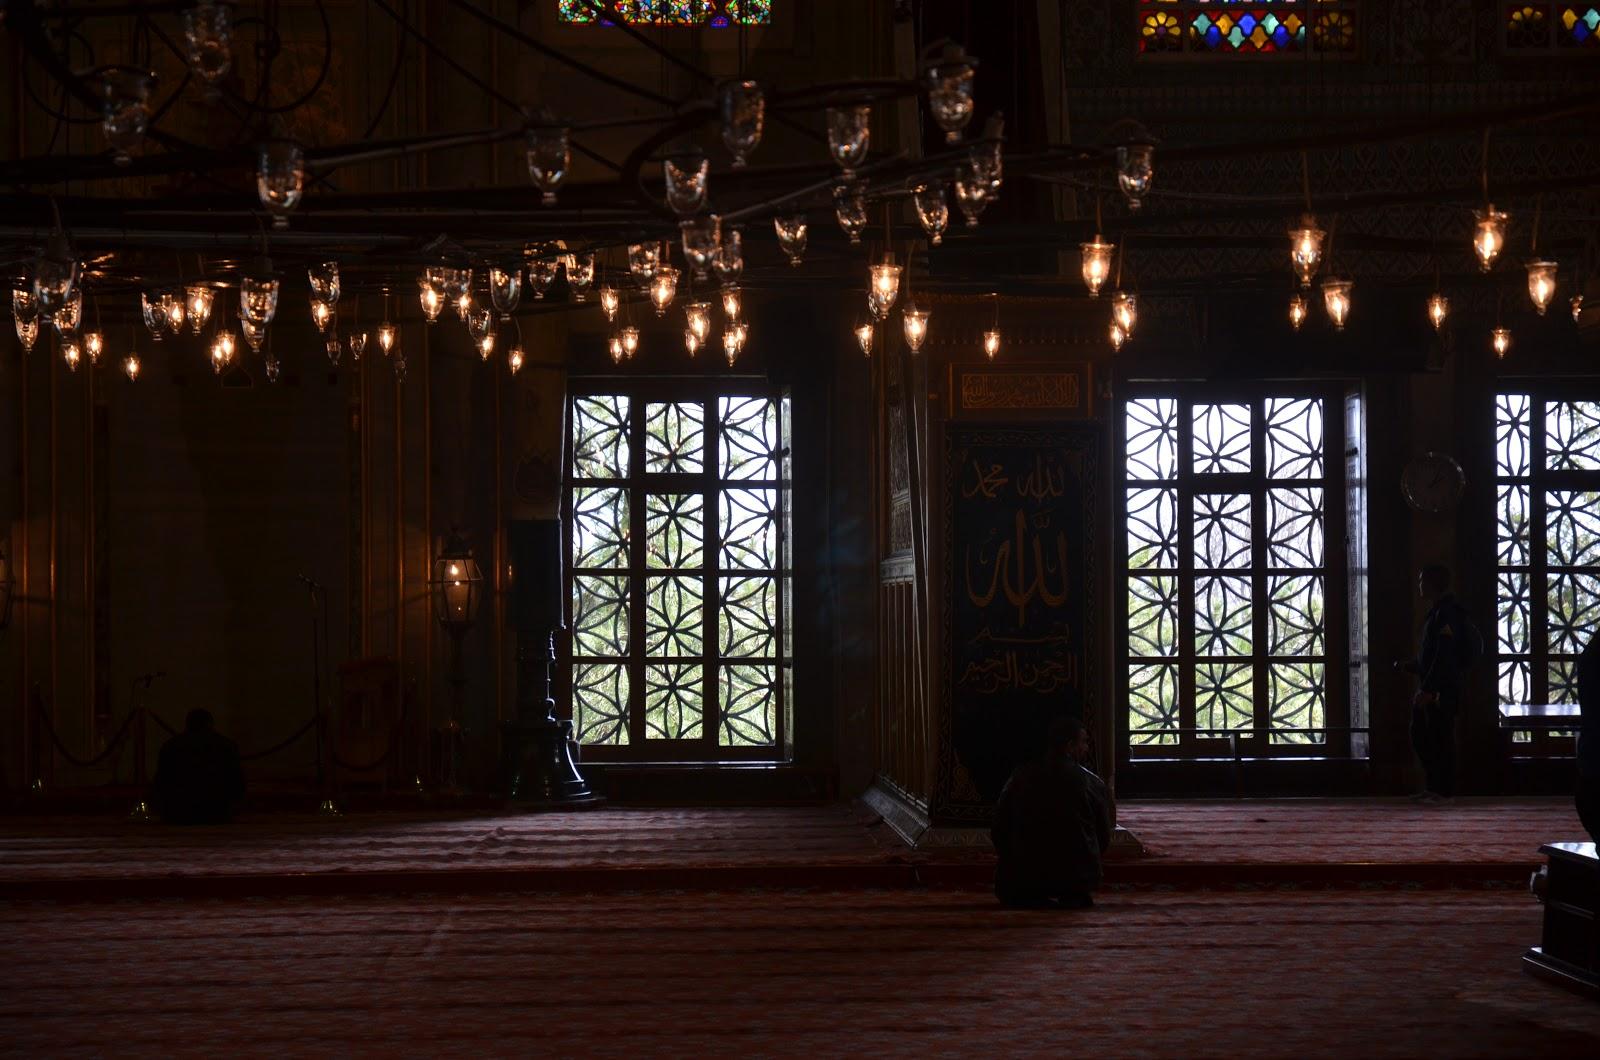 Blue Mosque window background